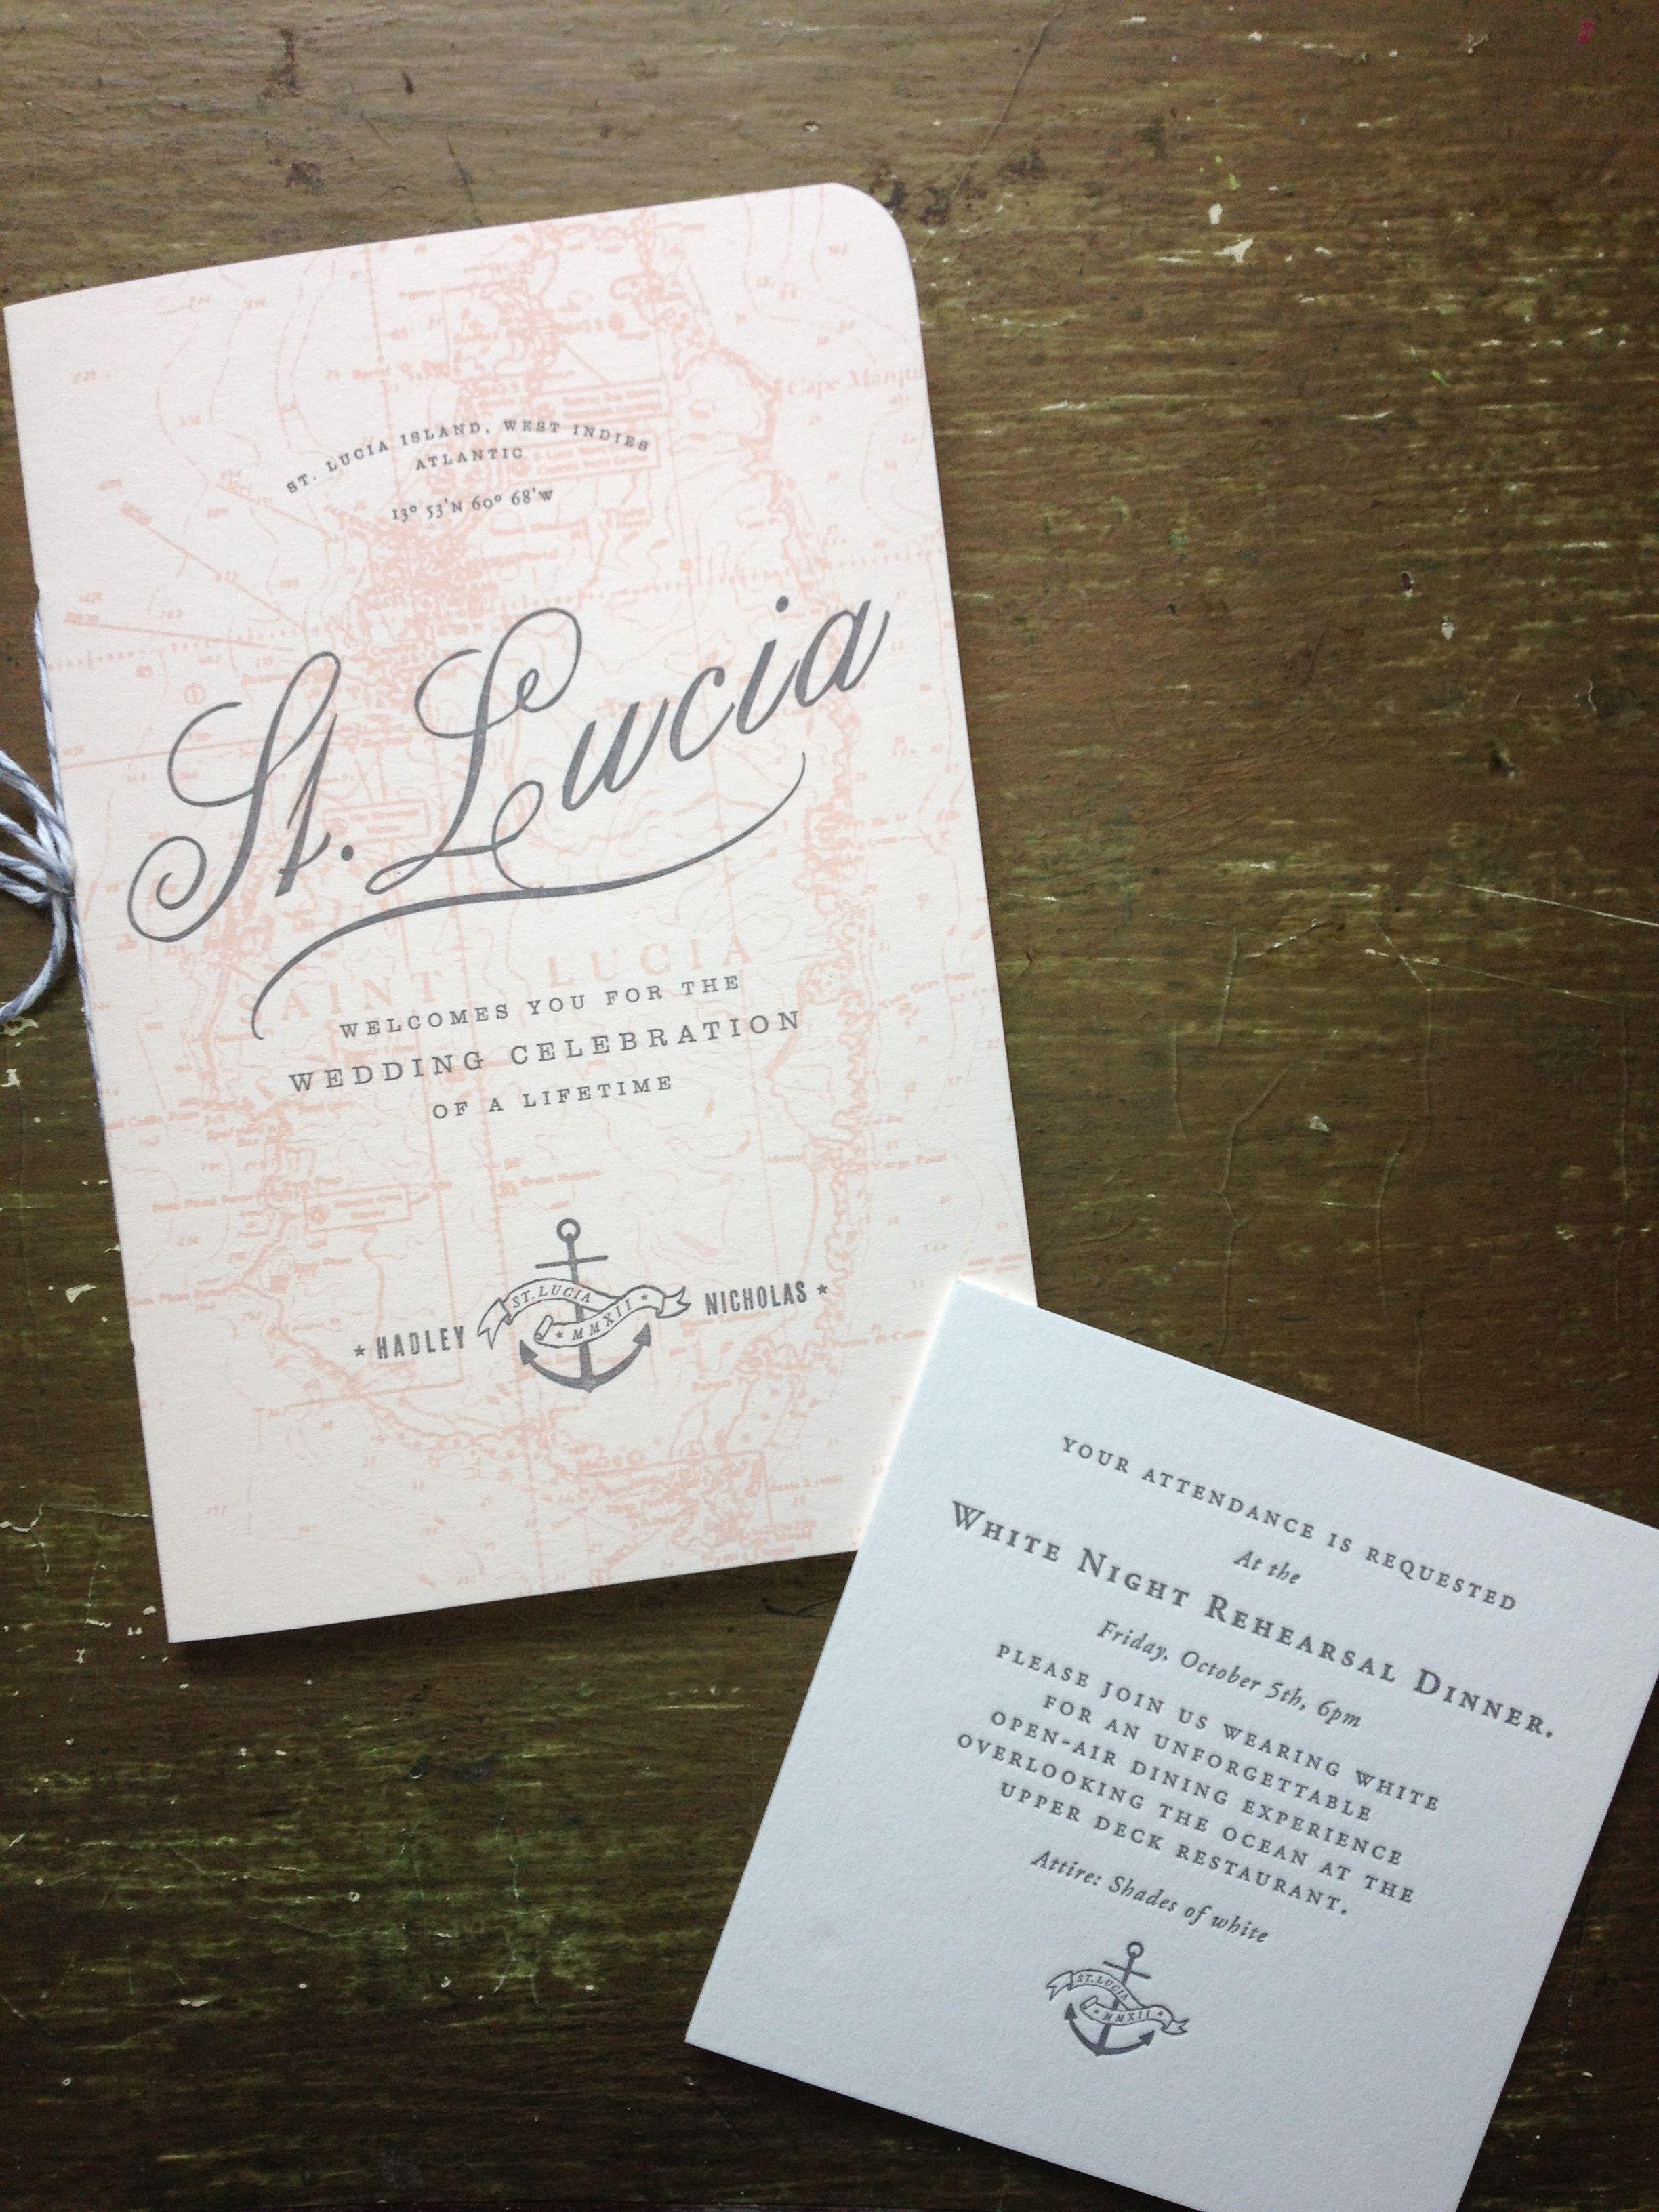 St. Lucia wedding invitation and rehearsal dinner invitation ...